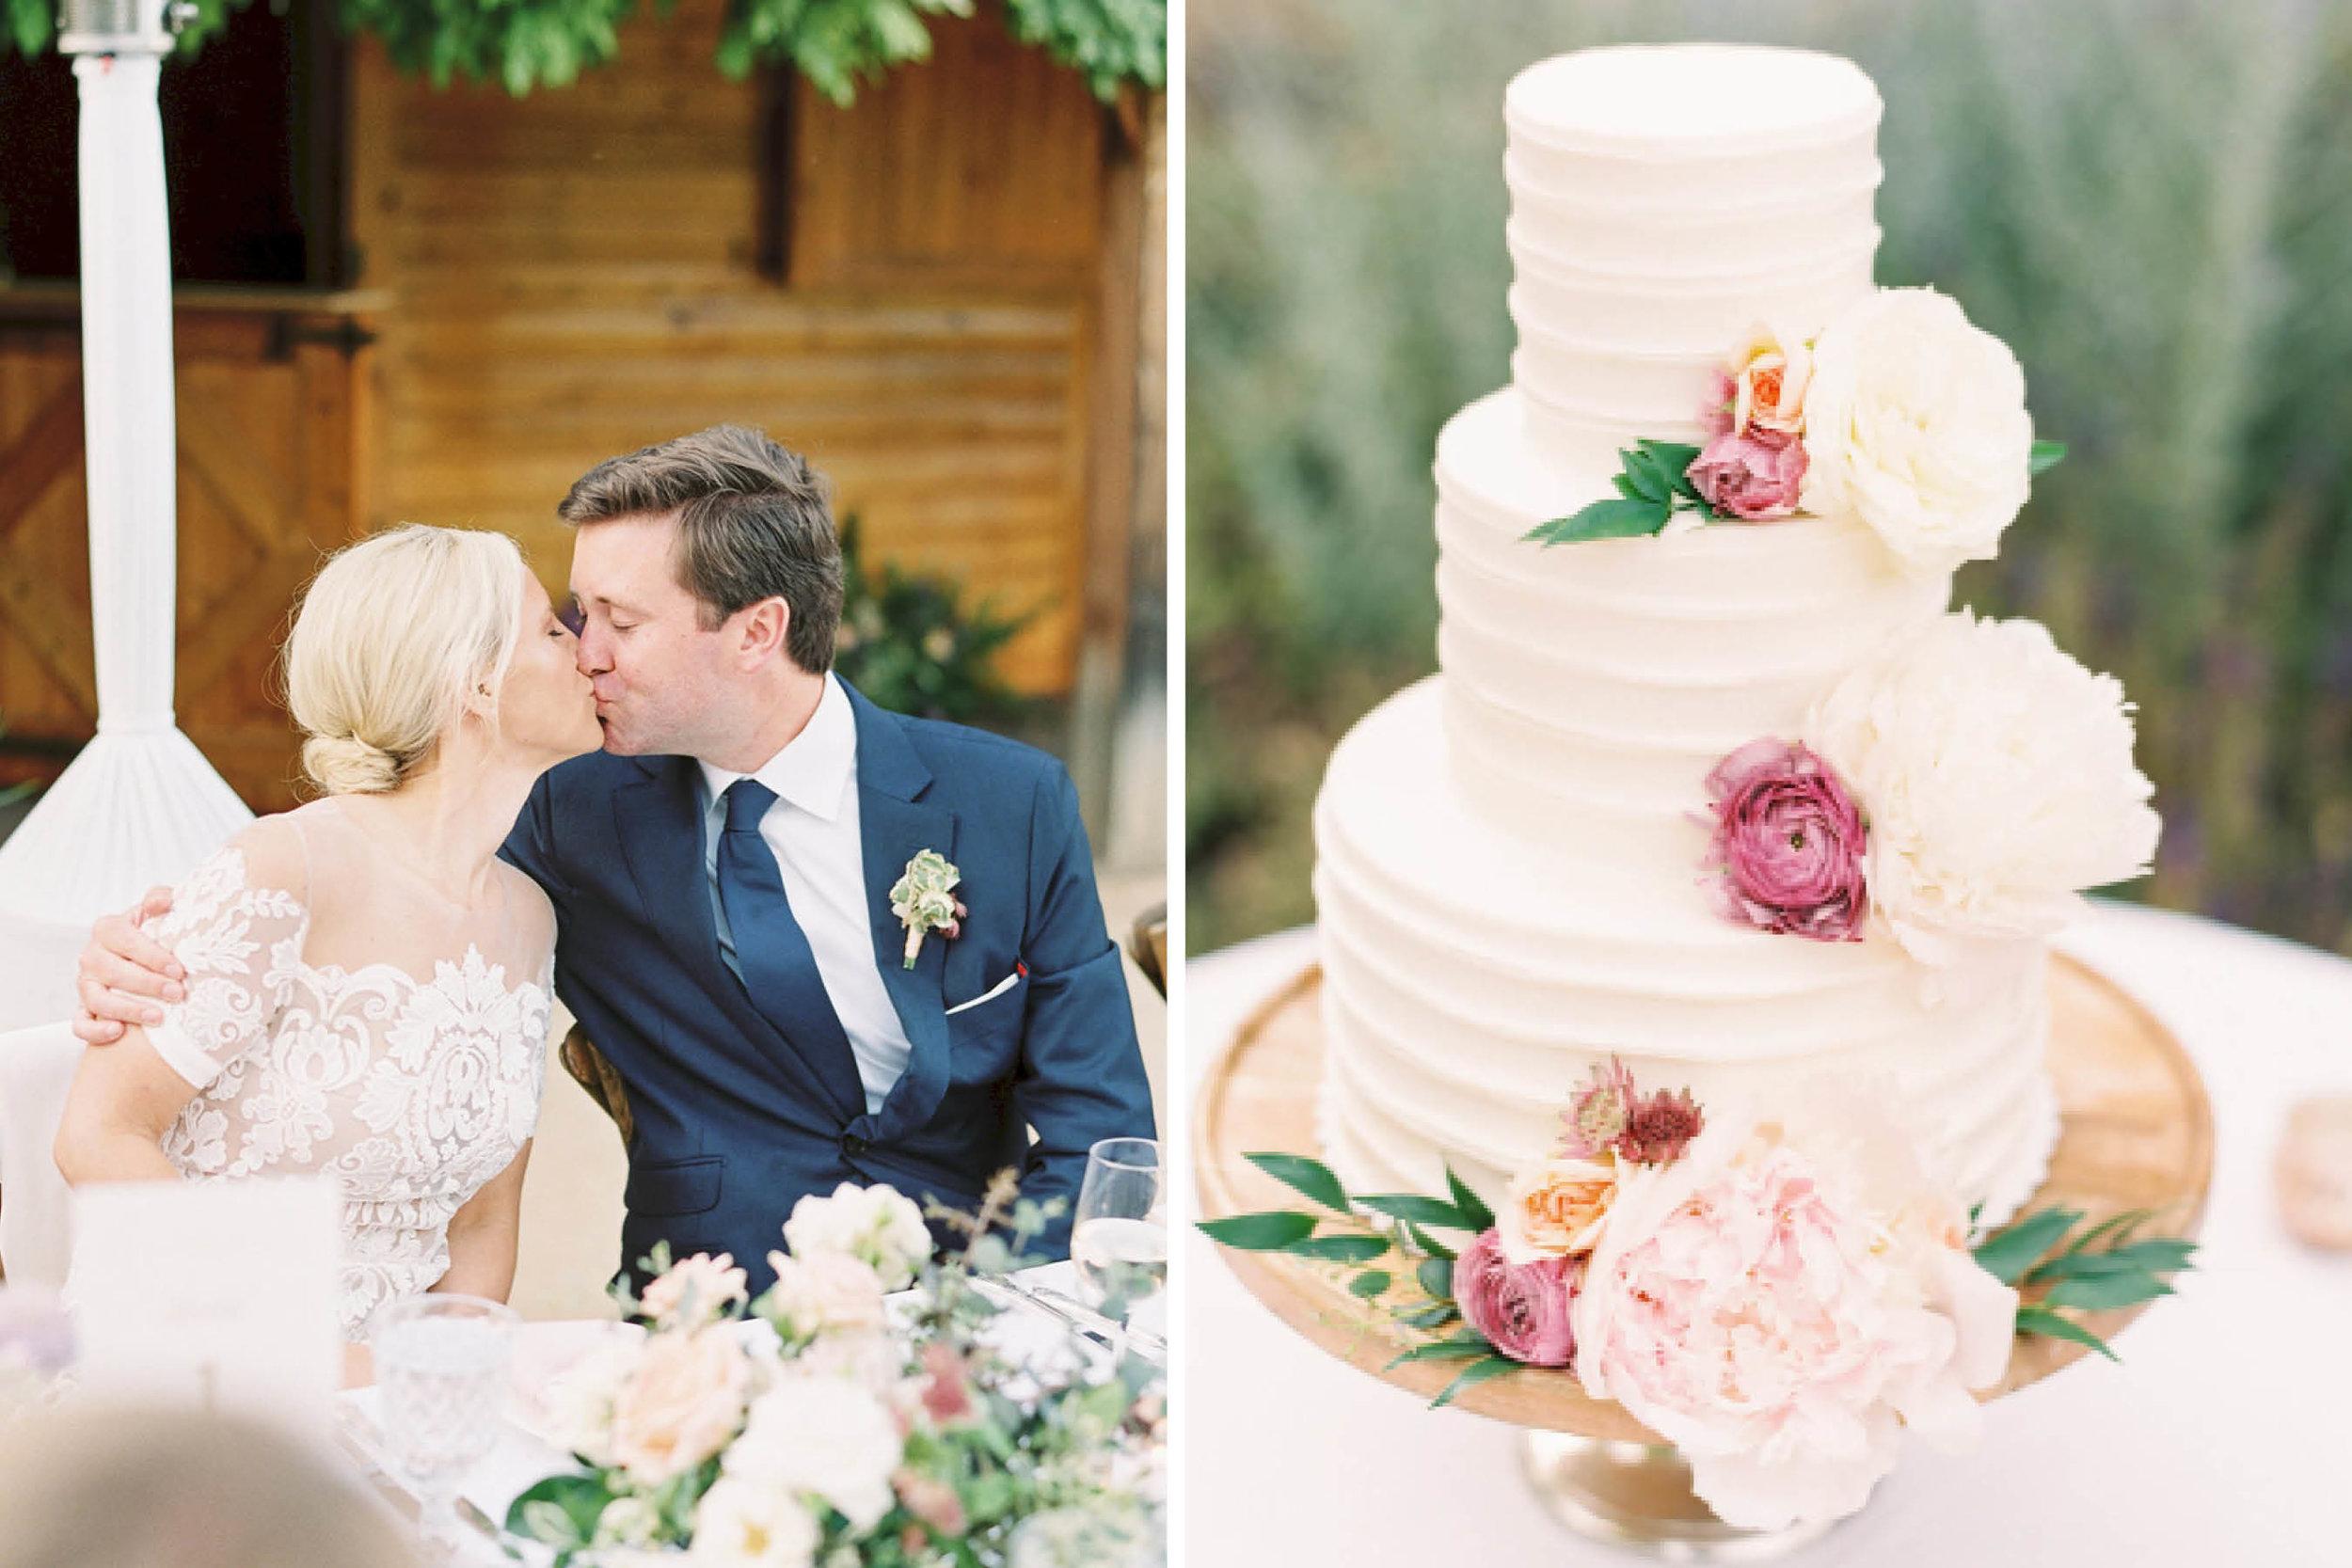 alegria-by-design-wedding-planner-planning-event-design-santa-barbara-day-of-coordinator-kestrel-park-santa-ynez-fields-castle-lavender-garden-mrs-box (46).jpg